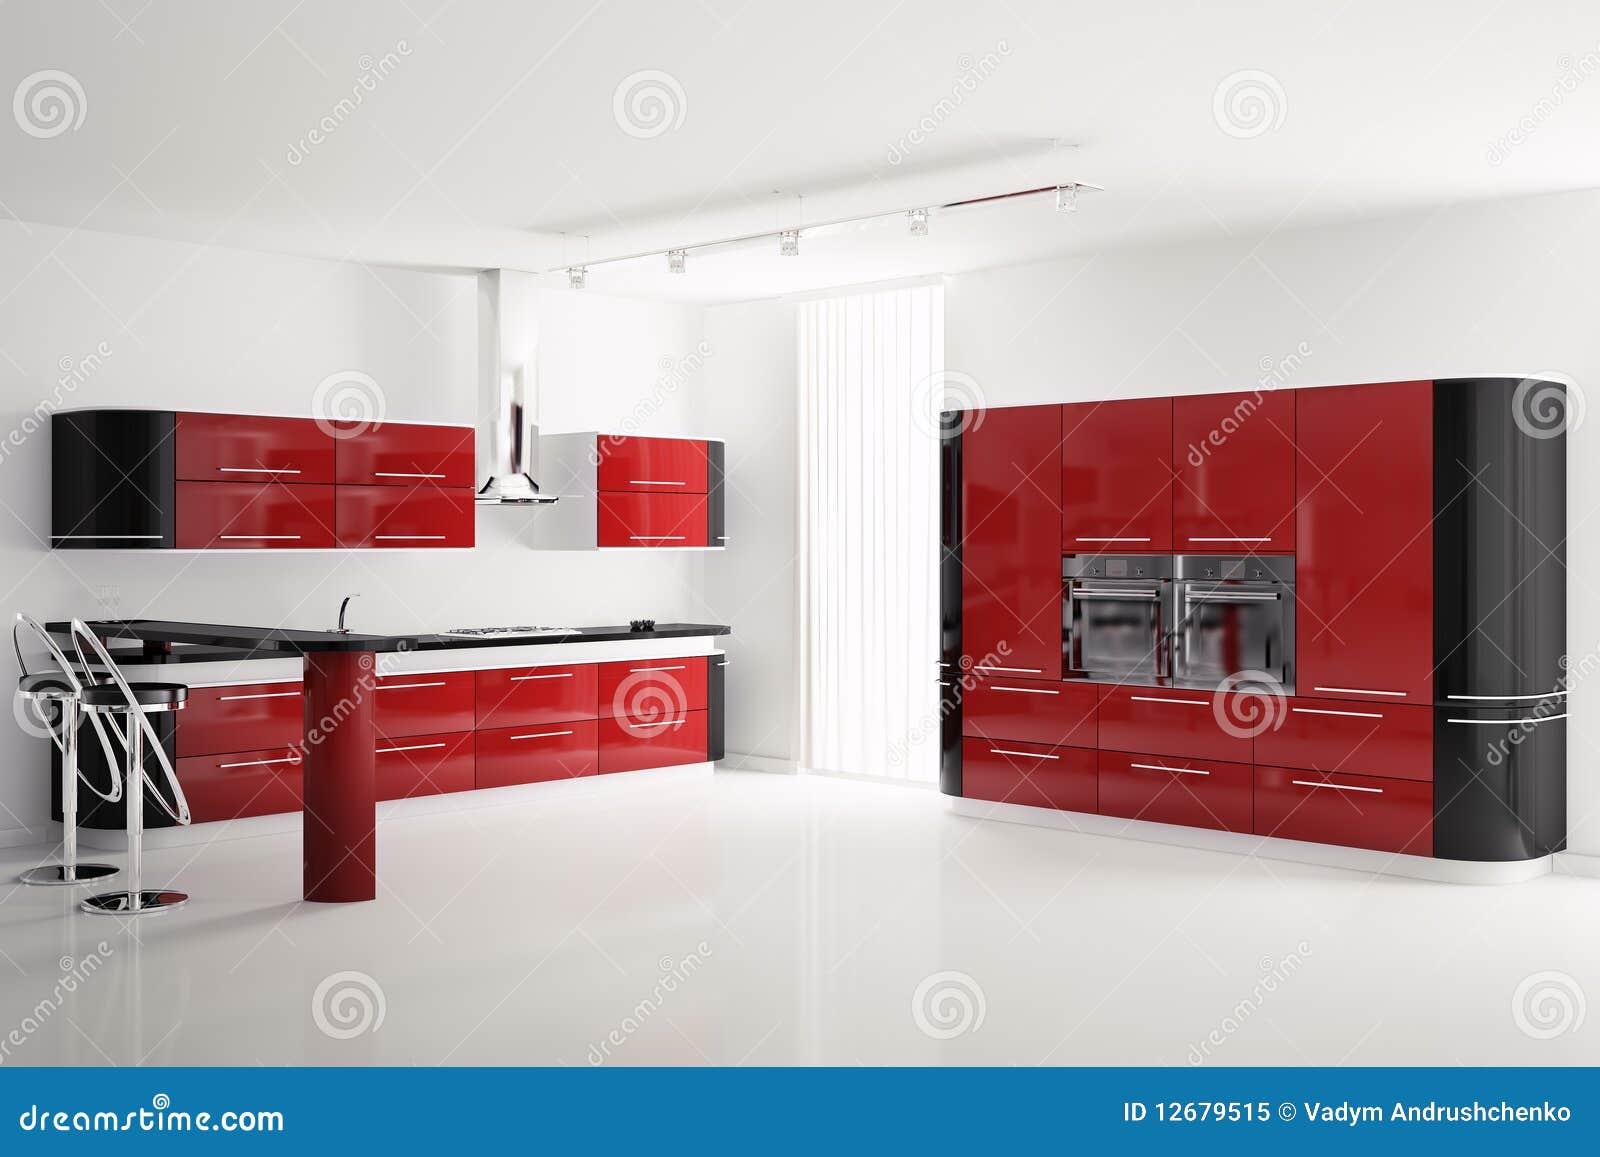 Cuisine moderne rouge photos – 9,599 cuisine moderne rouge images ...